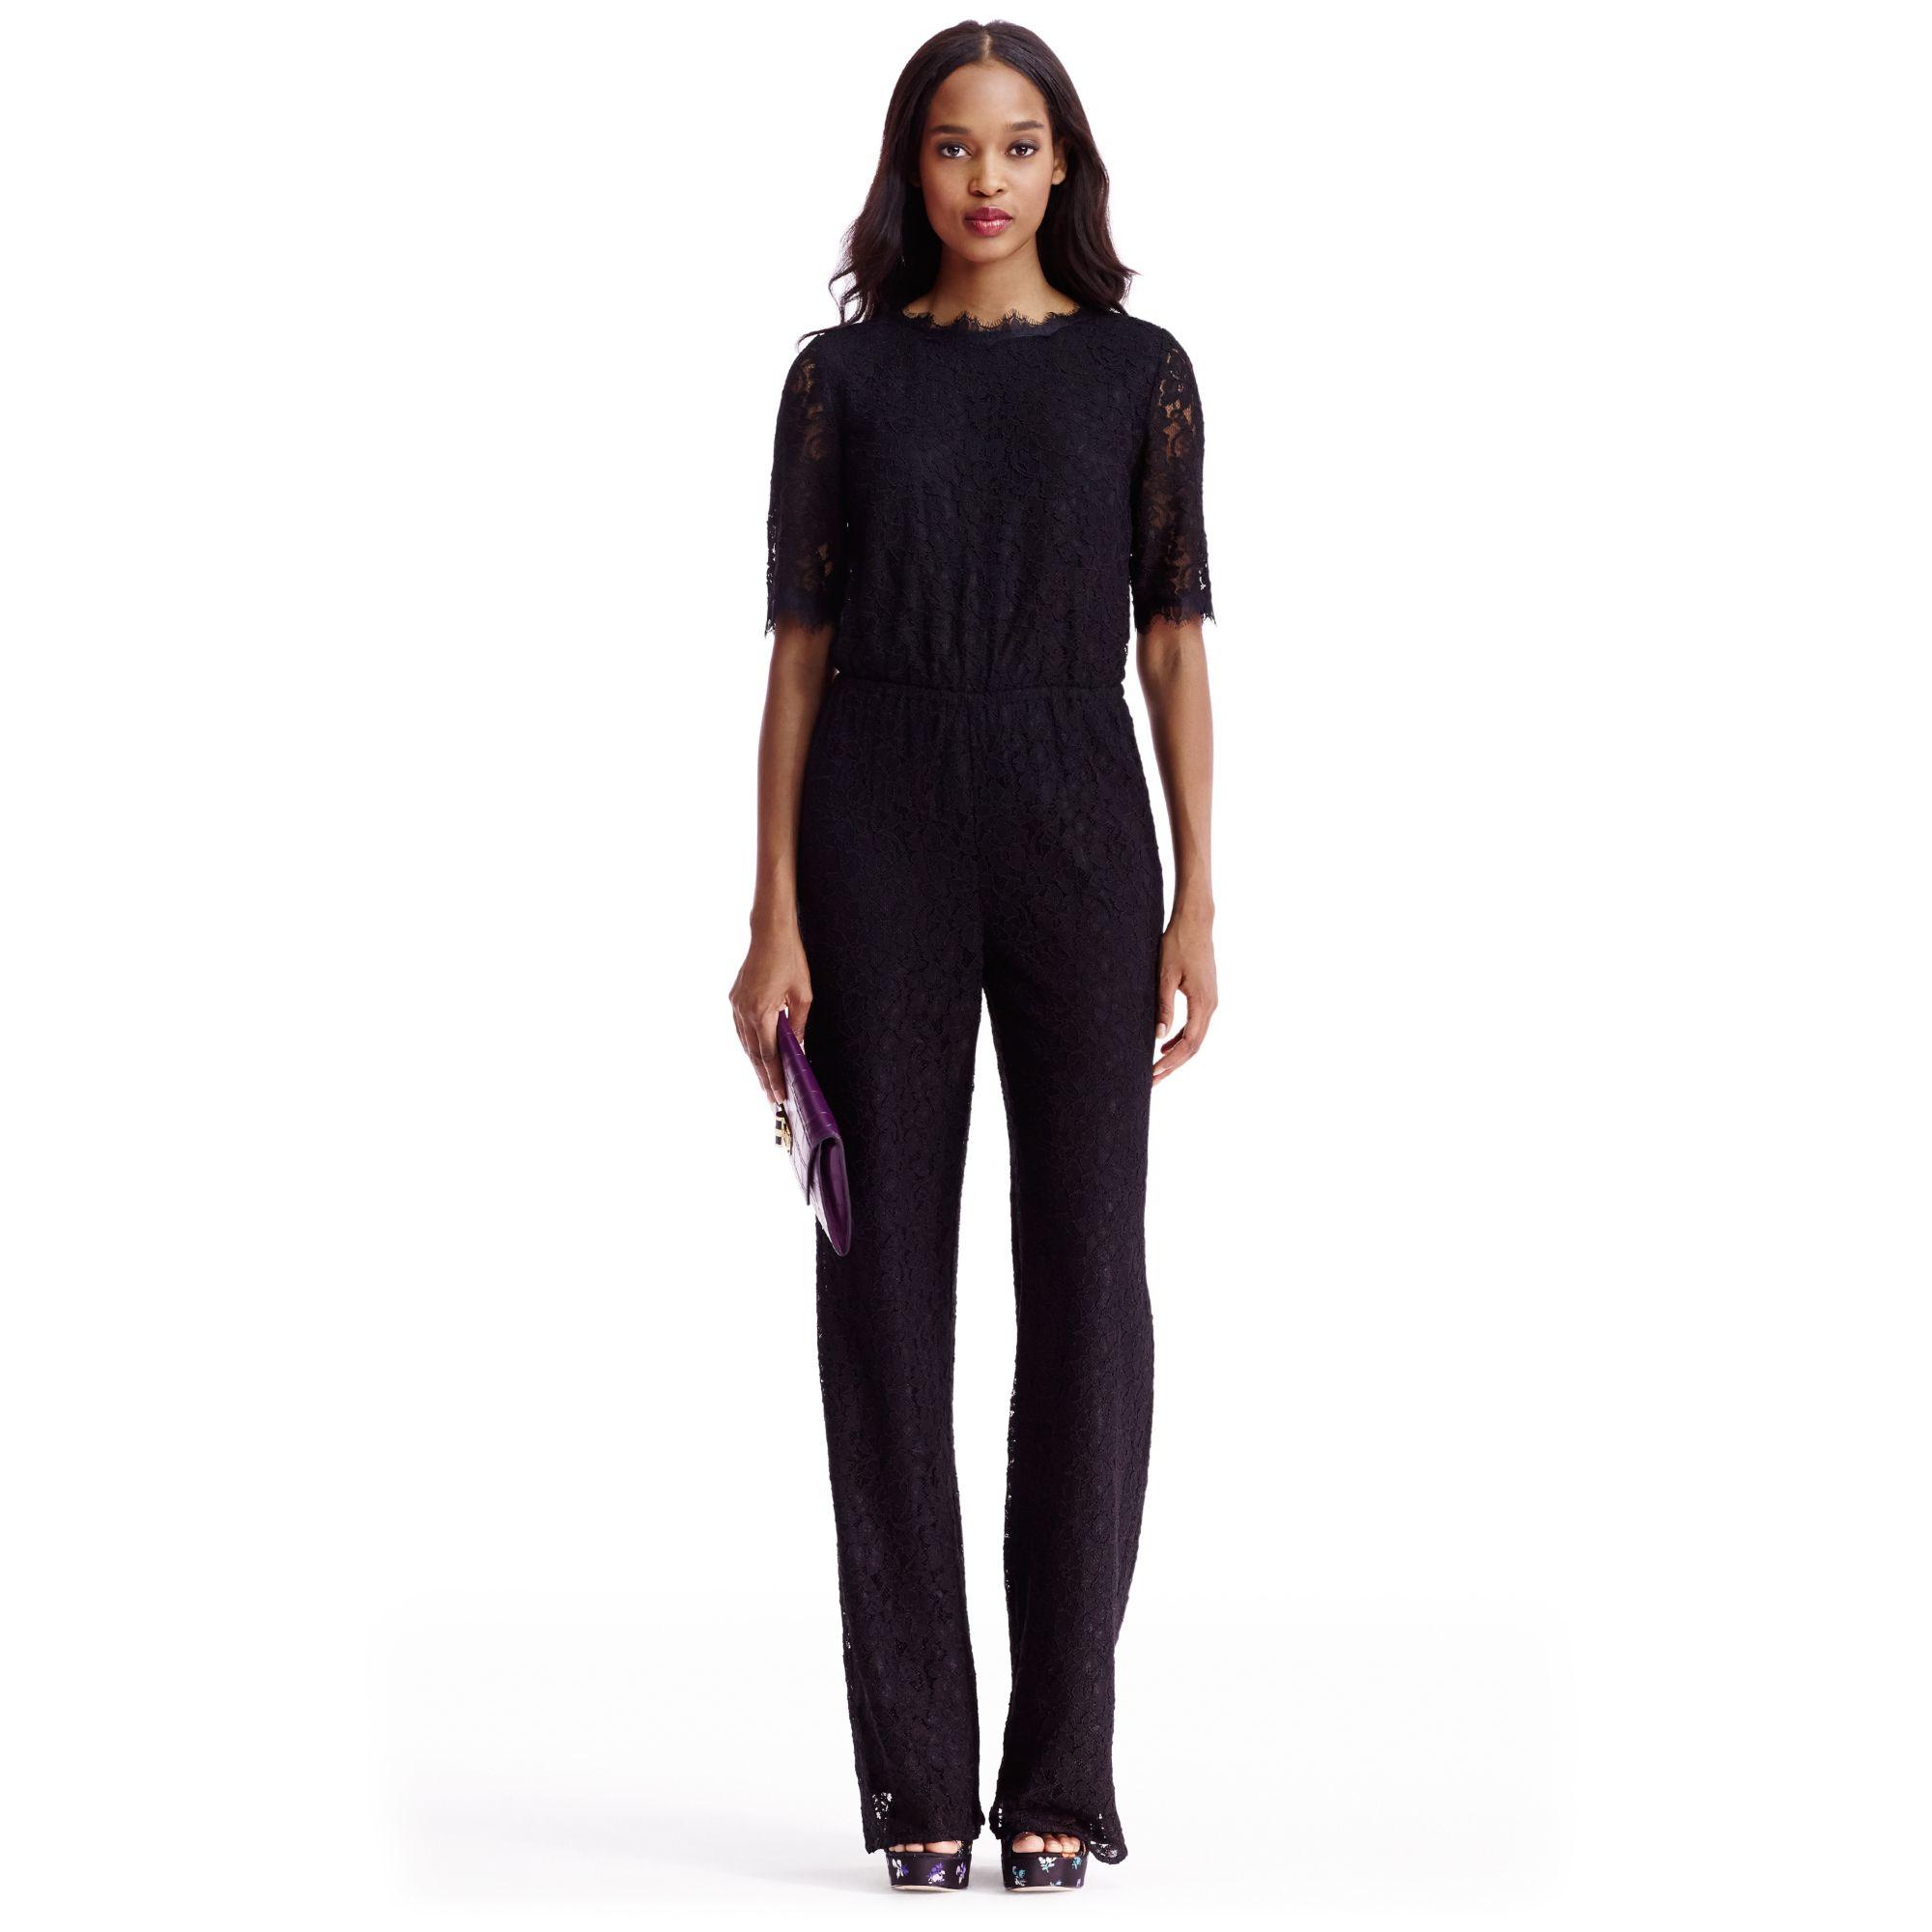 02a972036118 Diane von Furstenberg Dvf Kendra Lace Open Back Jumpsuit in Black - Lyst